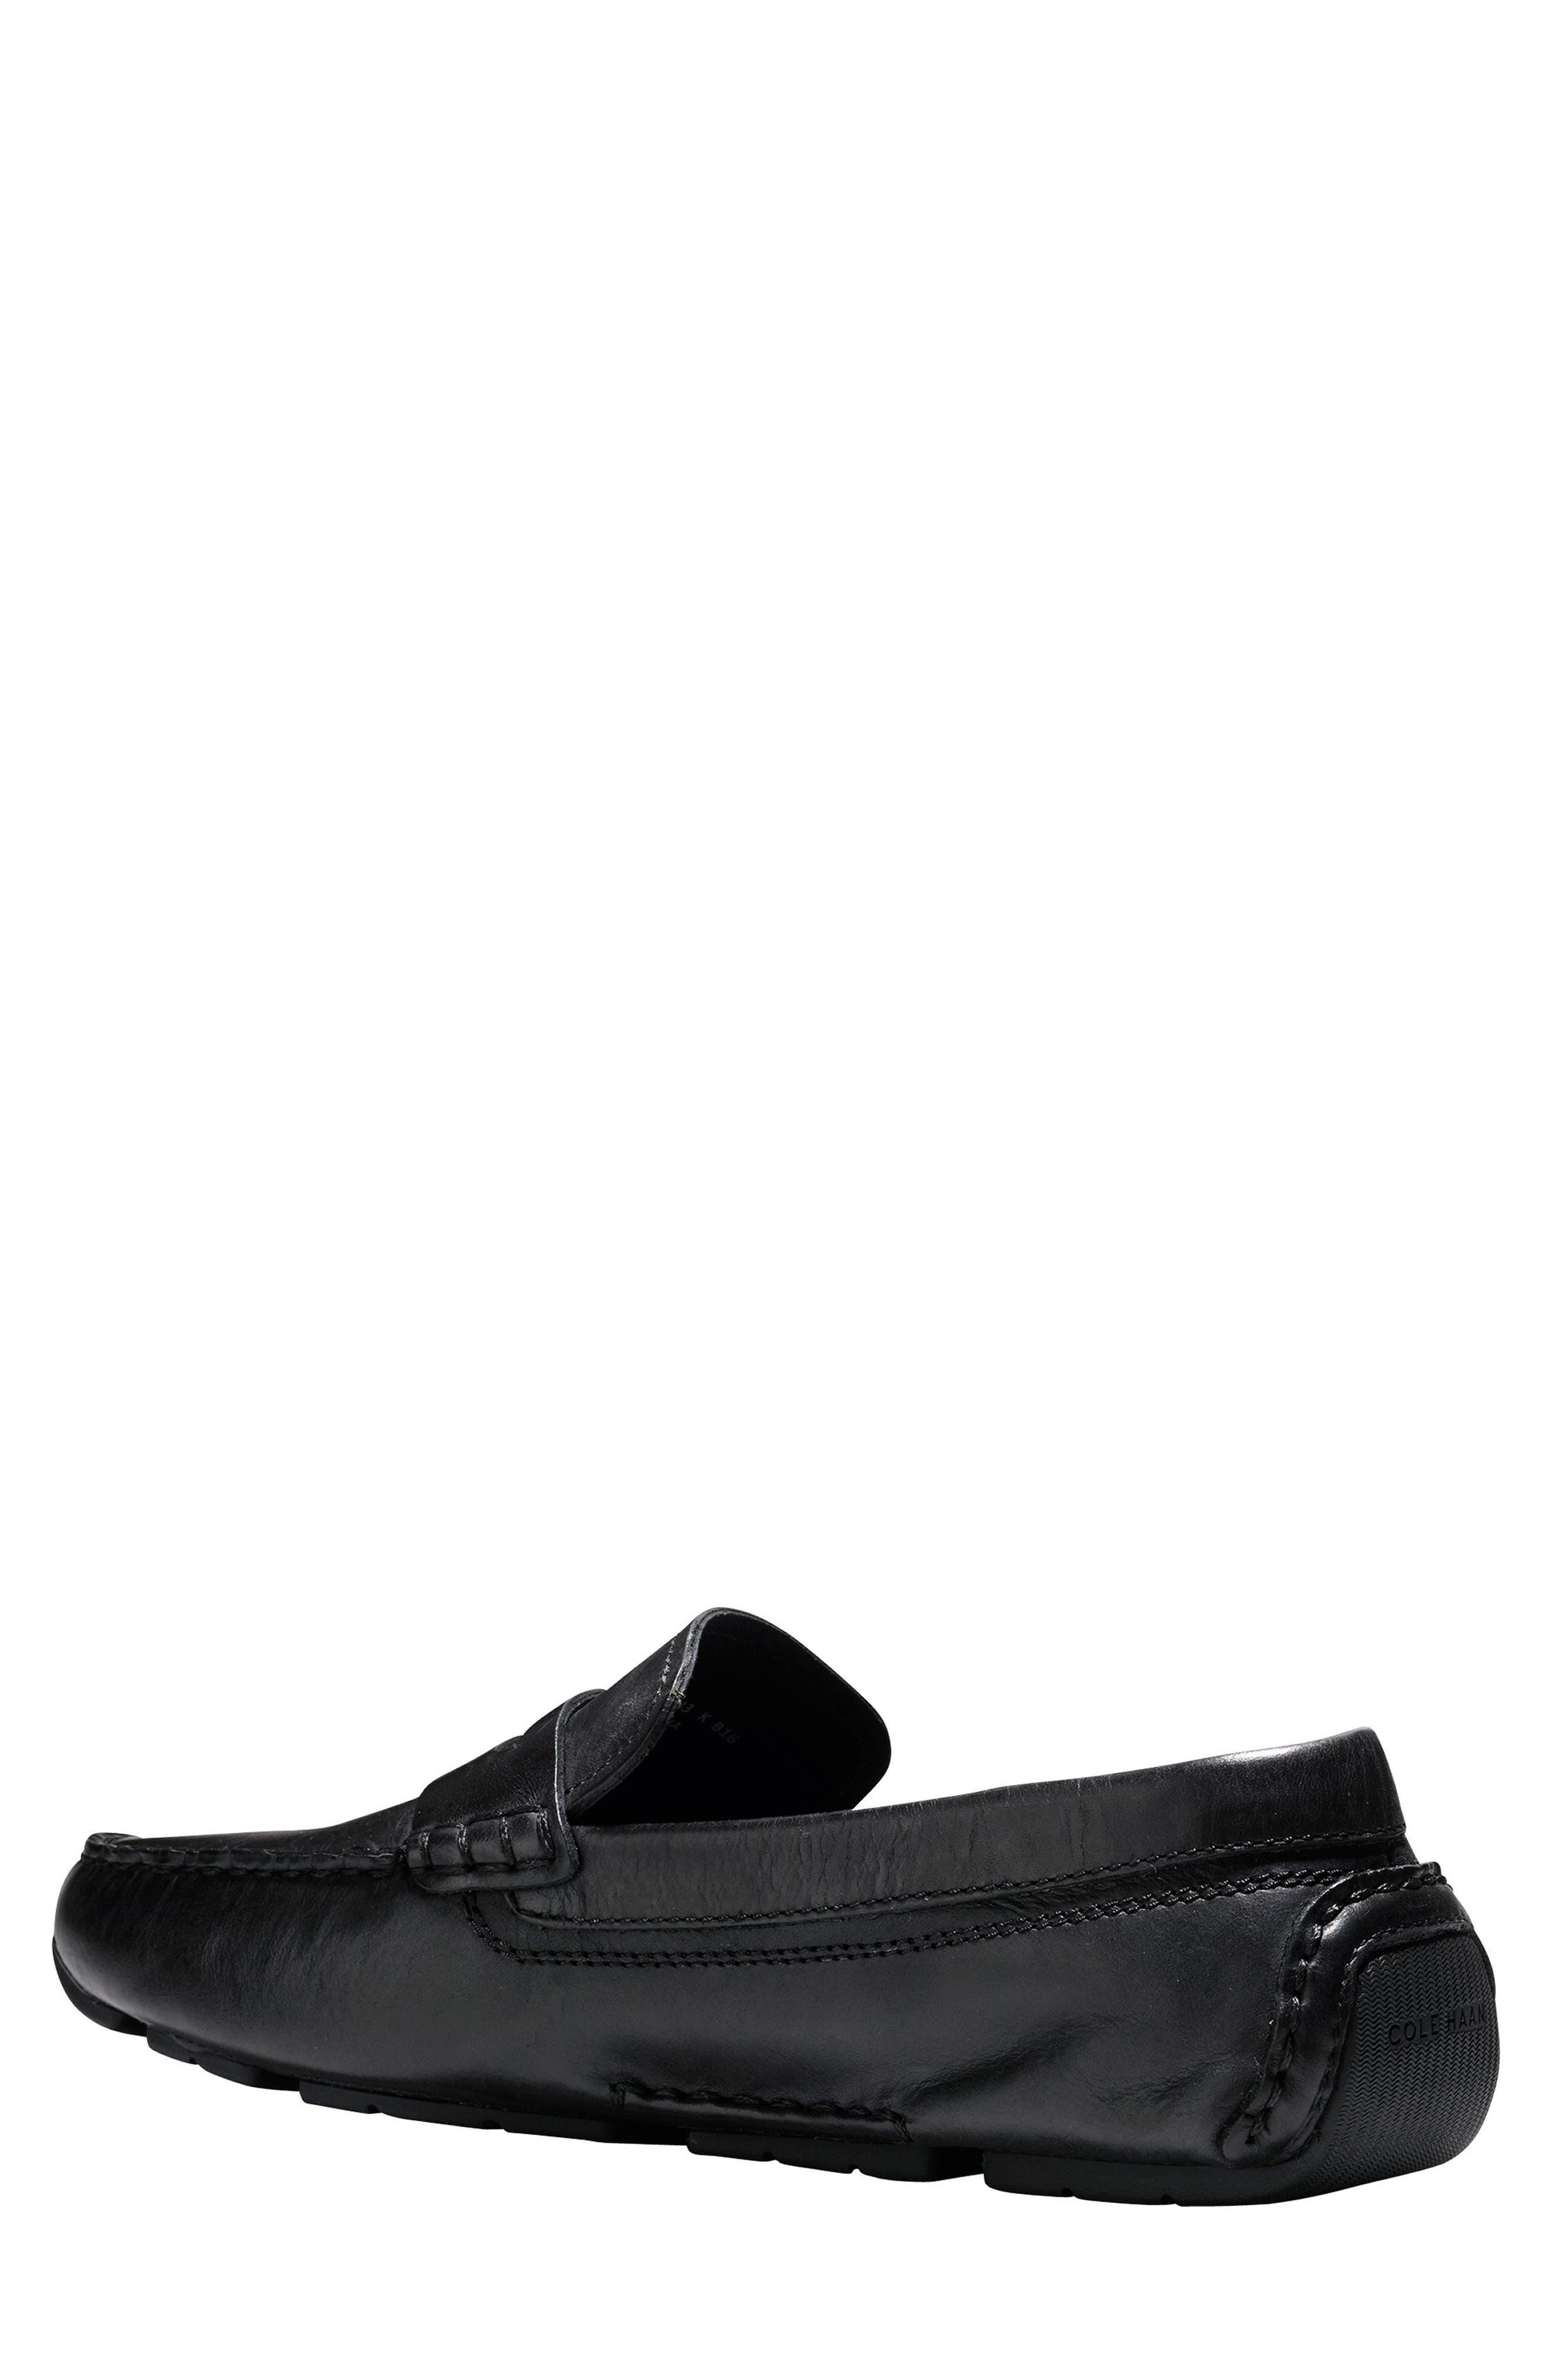 Kelson Driving Shoe,                             Alternate thumbnail 2, color,                             Black